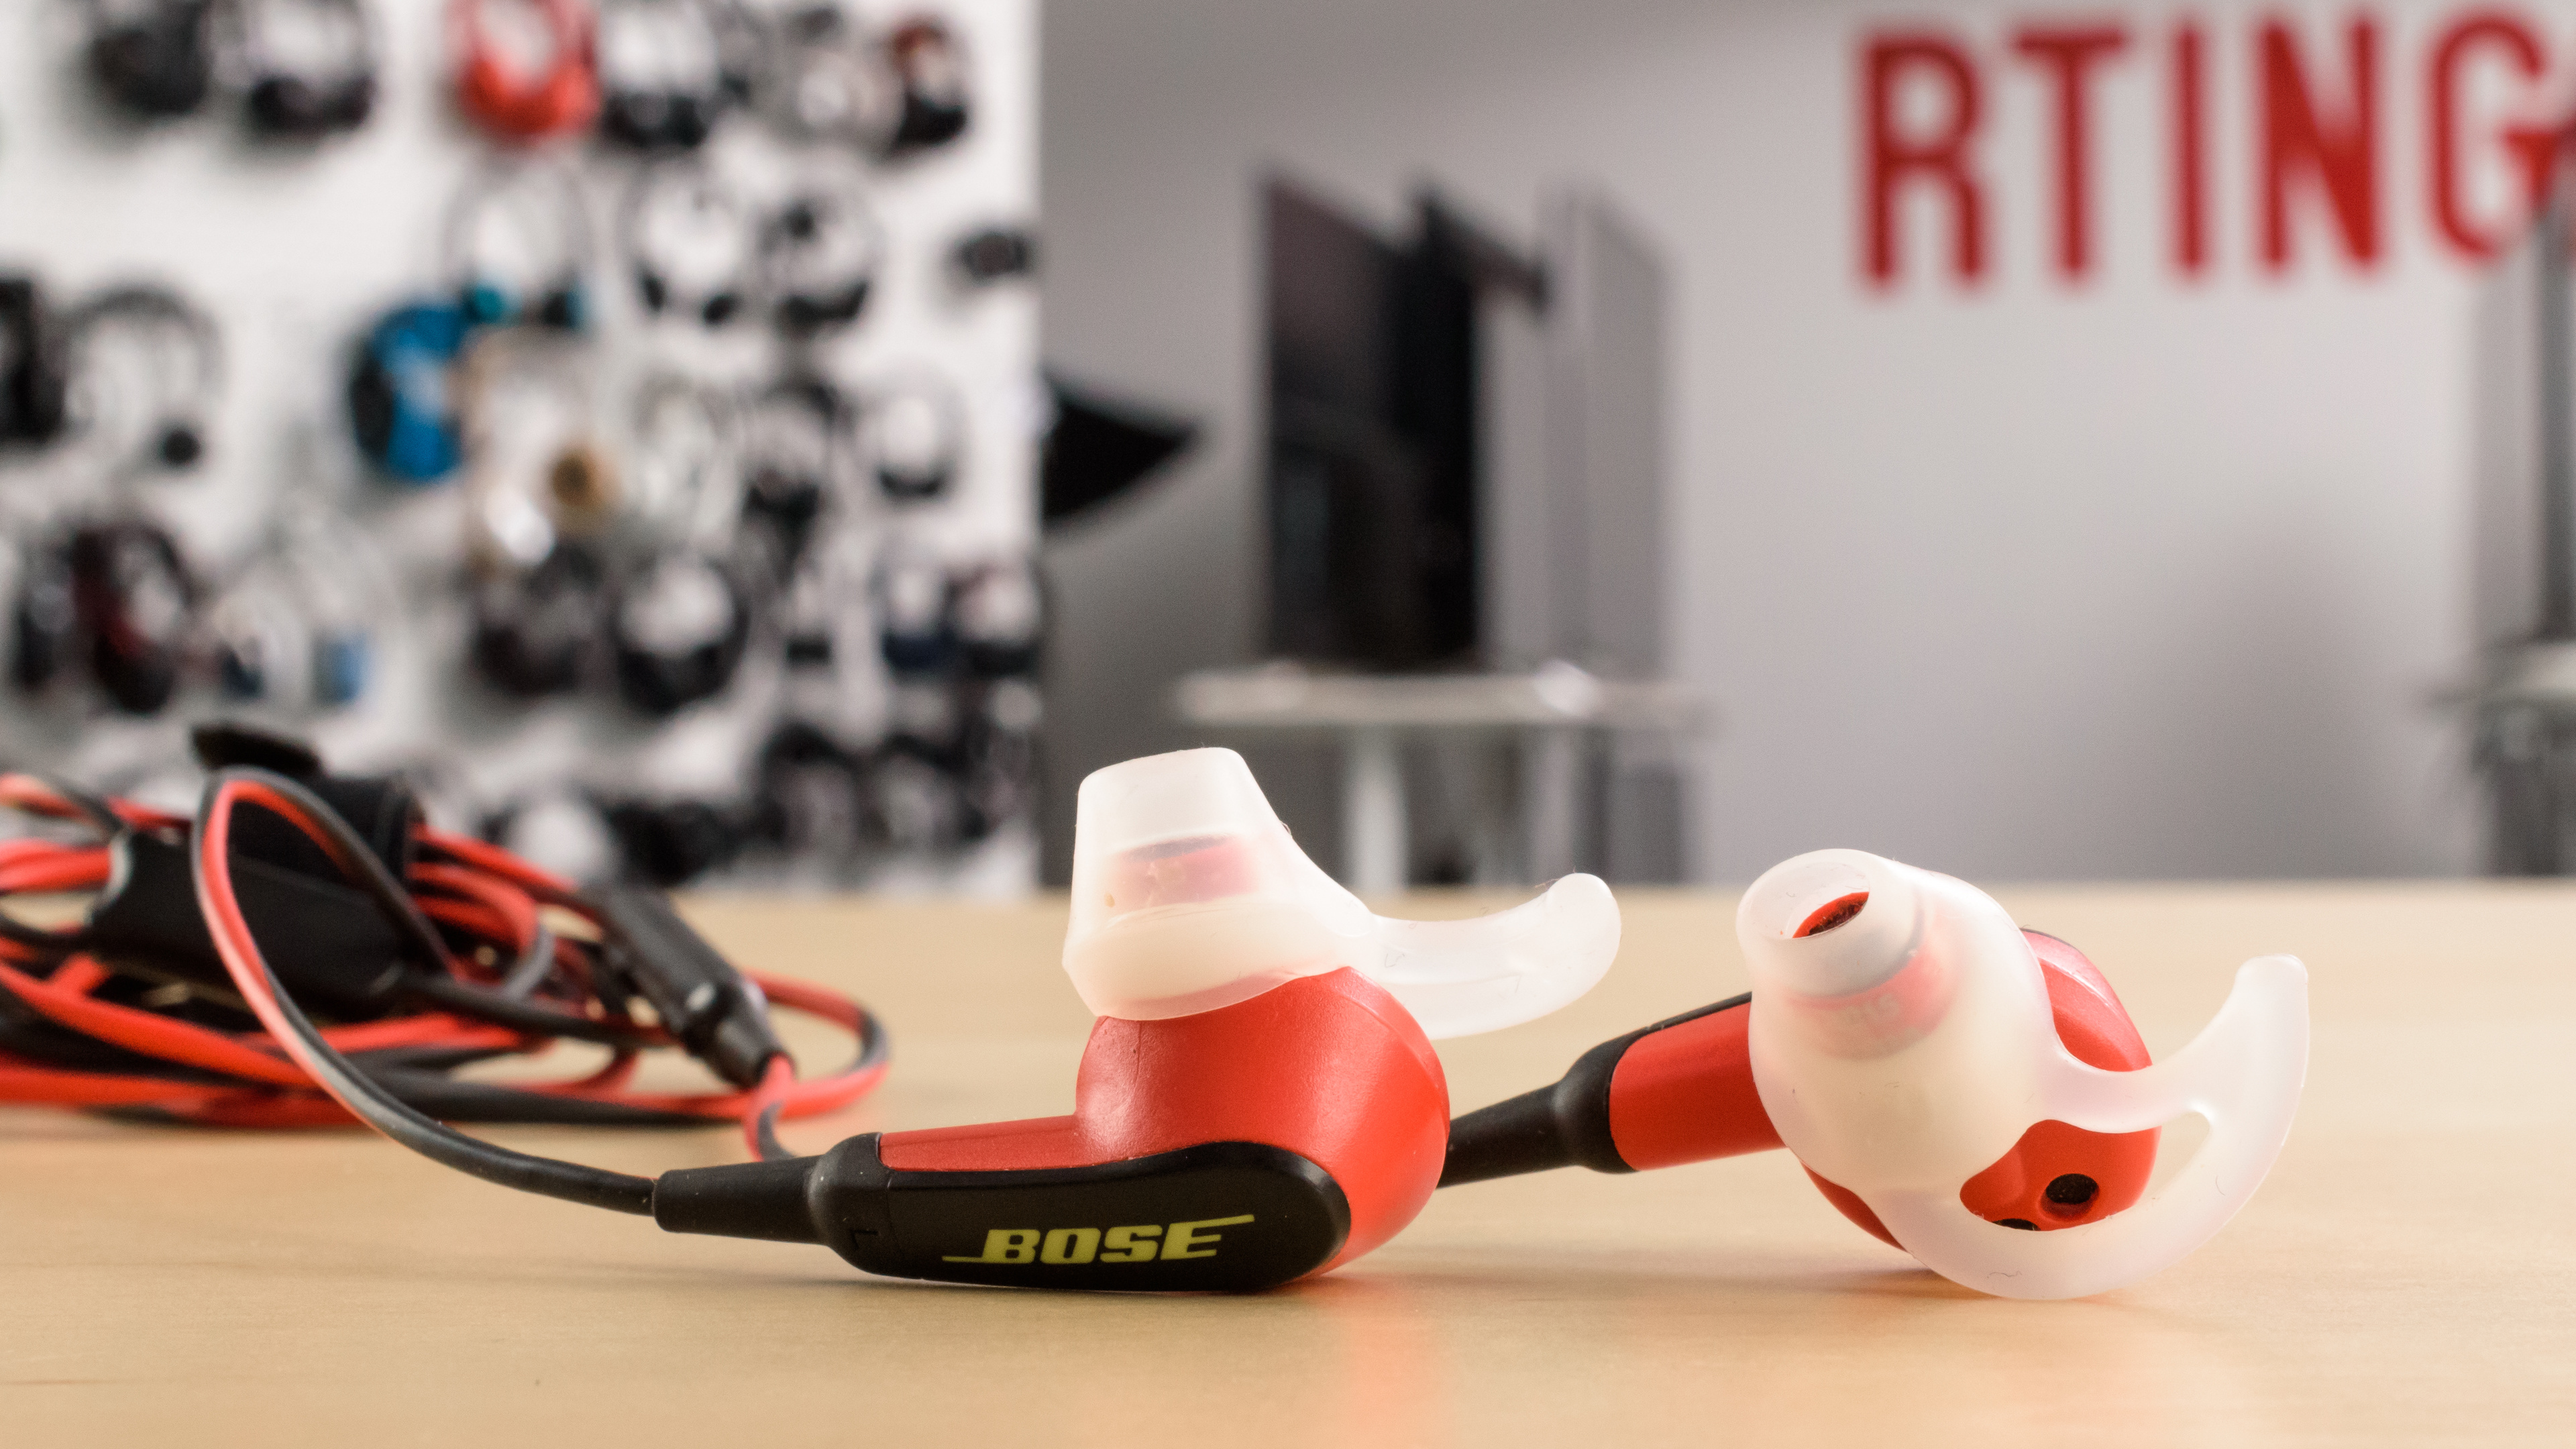 bose samsung earphones